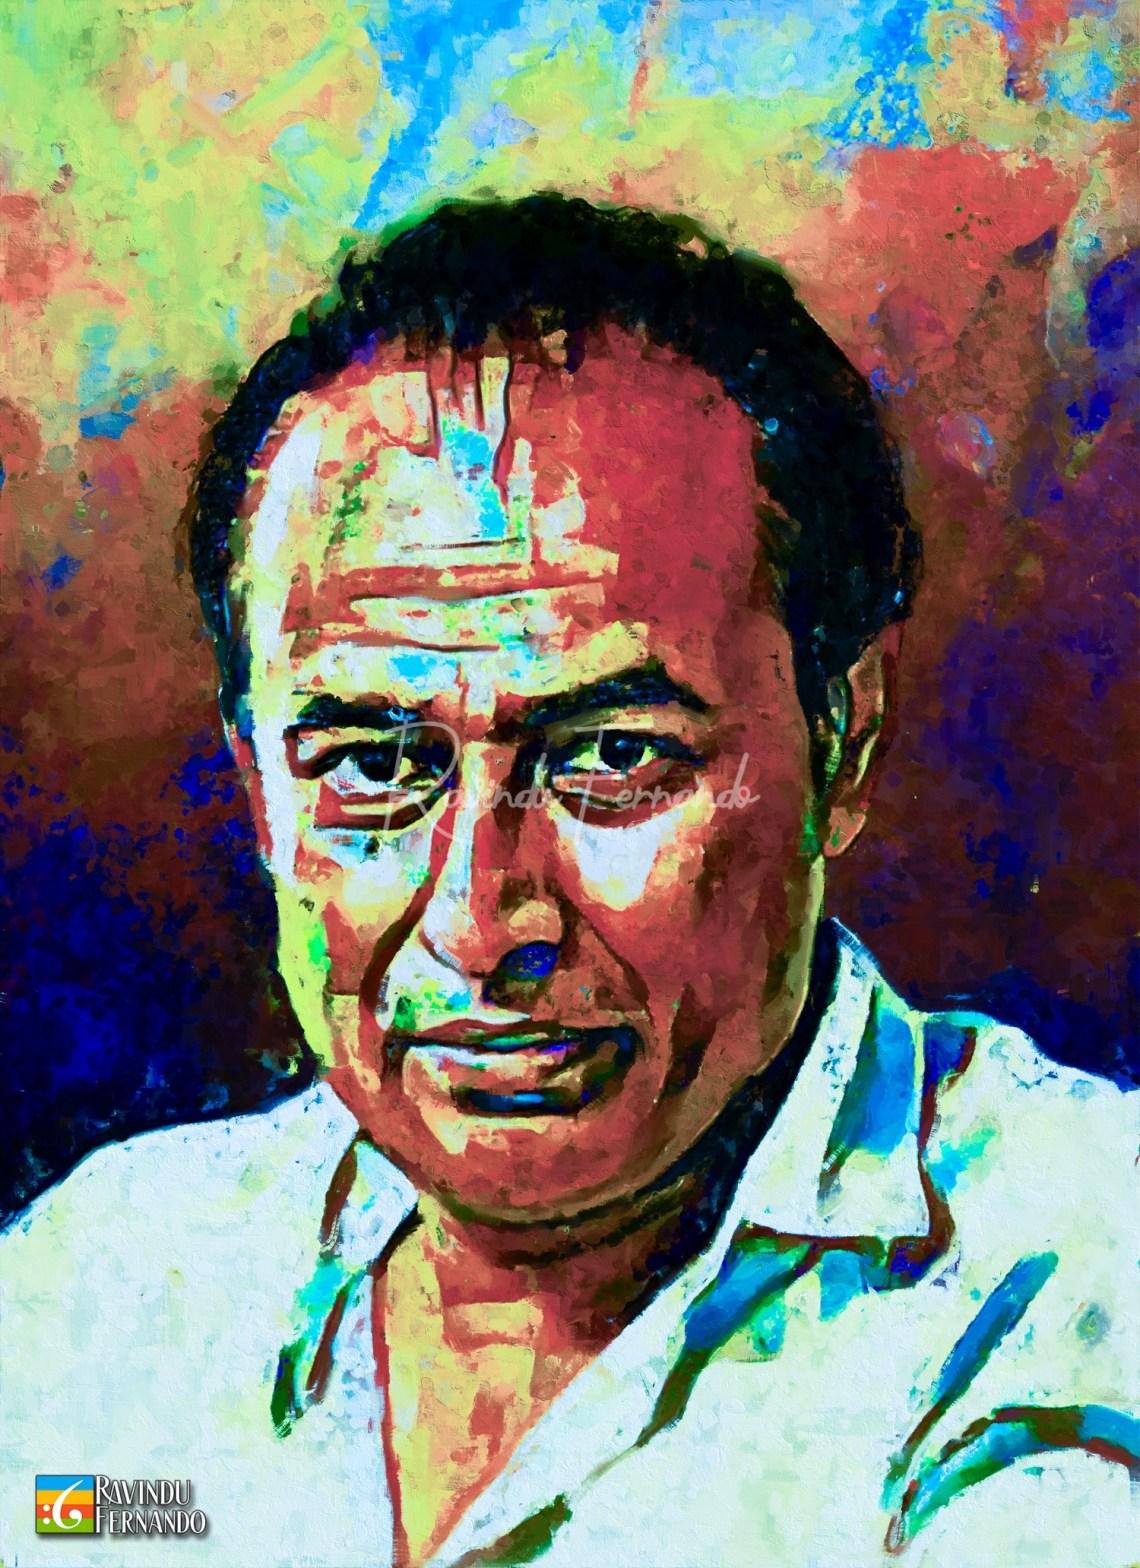 Gamini Fonseka Digital Oil Painting by Ravindu Fernando (2)